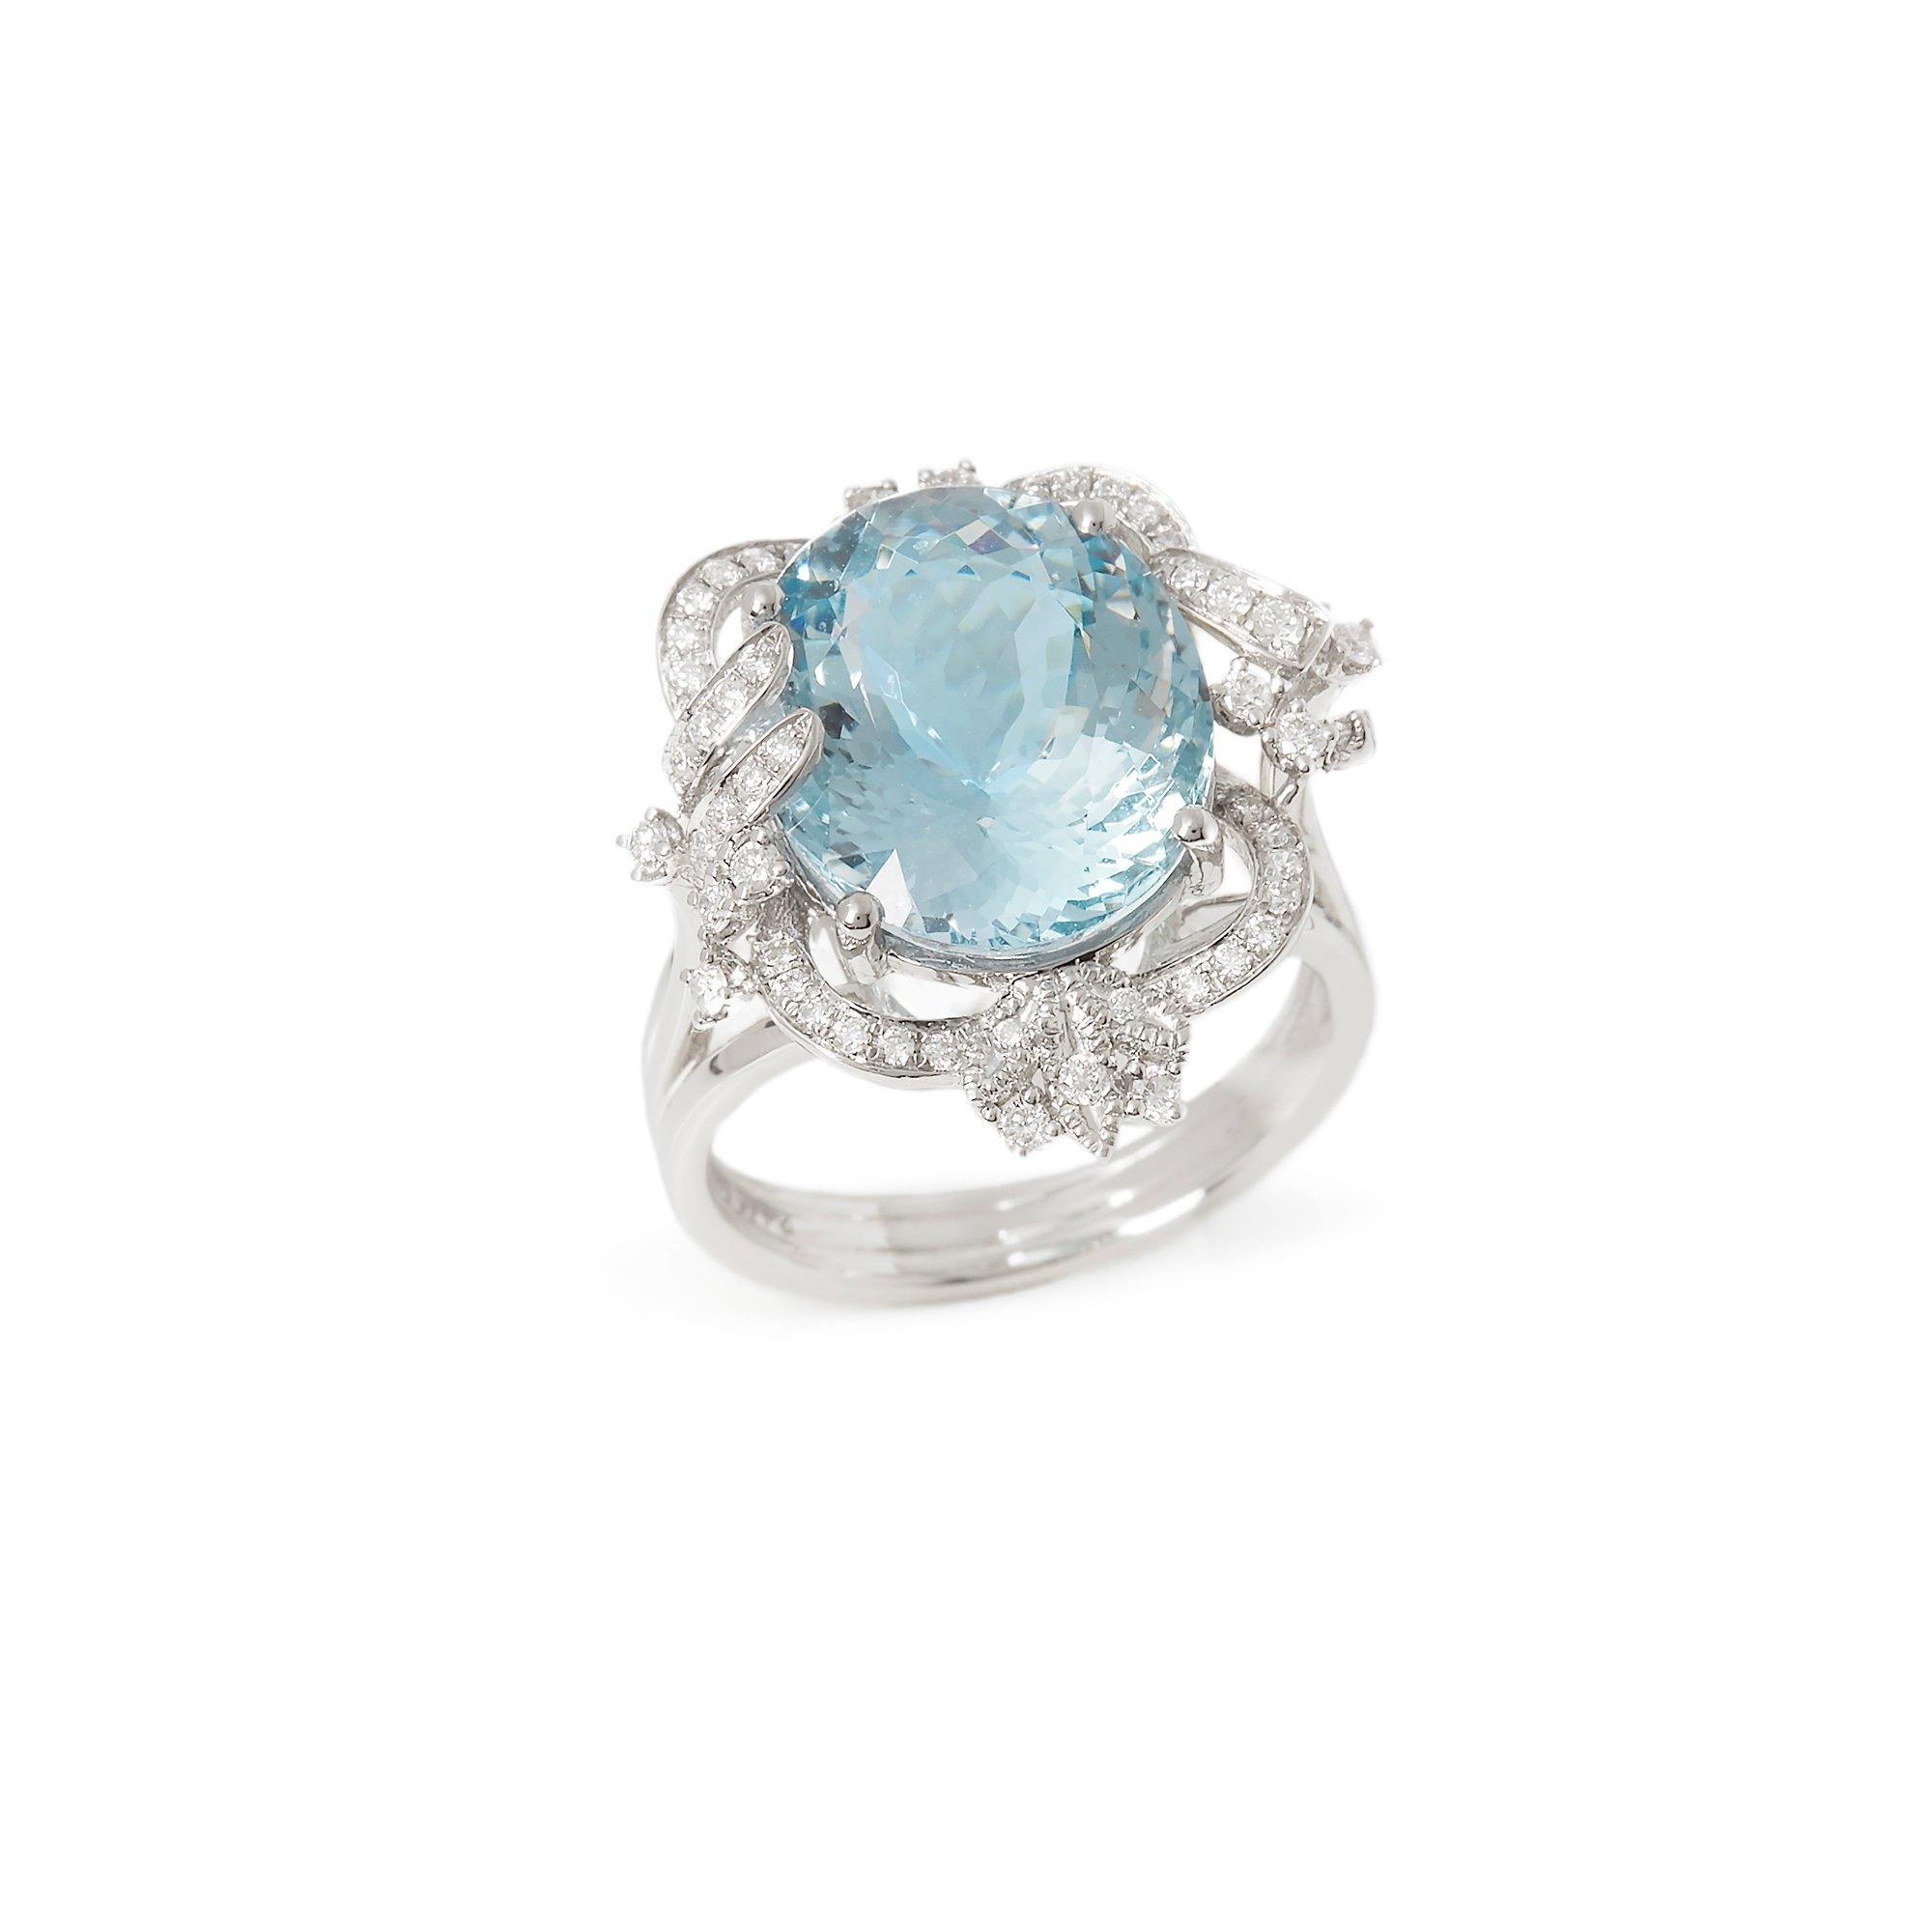 David Jerome Certified 7.98ct Brazilian Aquamarine and Diamond Platinum Ring